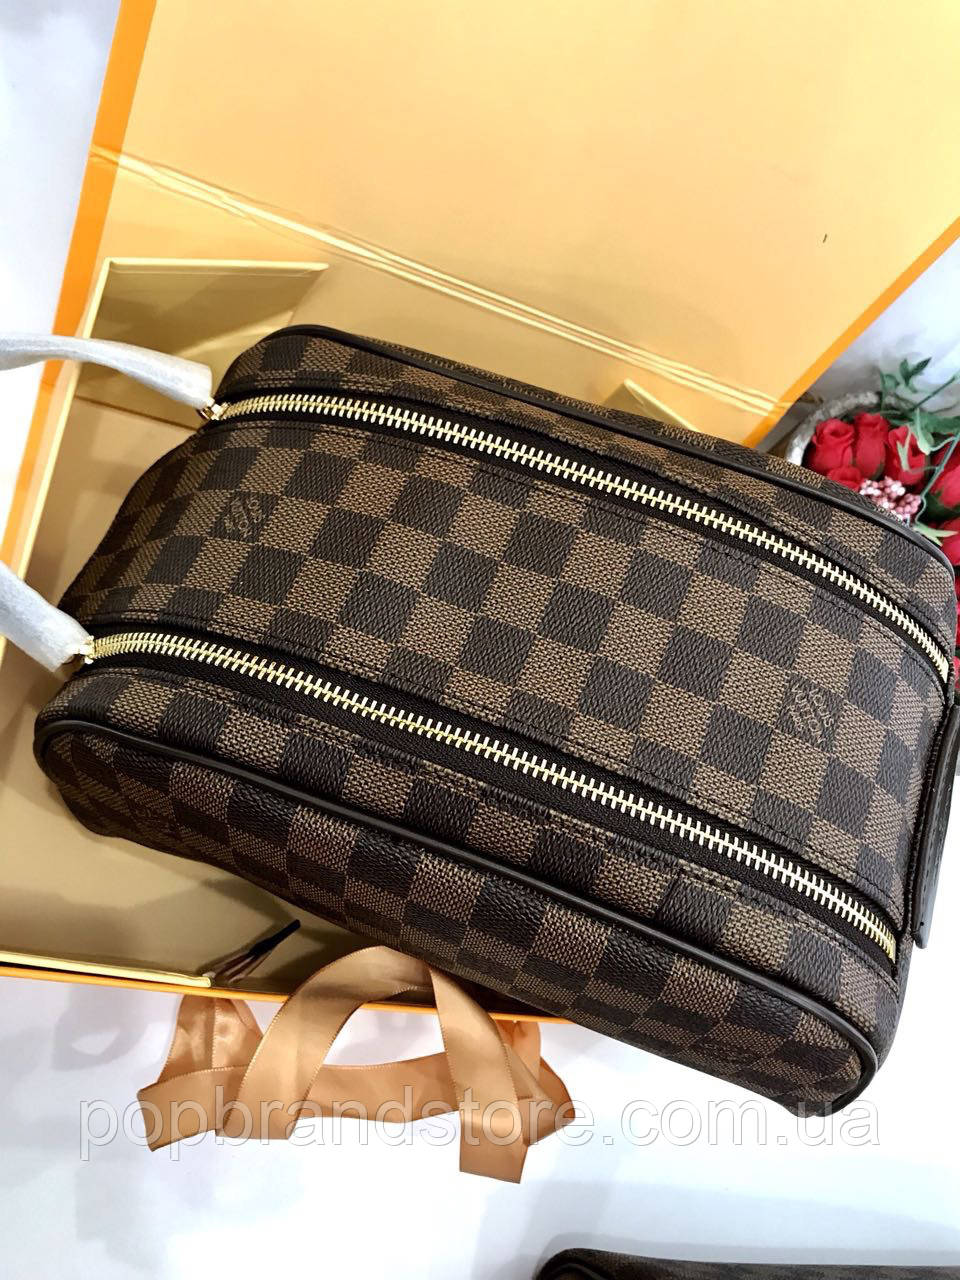 85ebdf35bf32 Косметичка Louis Vuitton Damier Canvas коричневая (реплика) - Pop Brand  Store | брендовые сумки